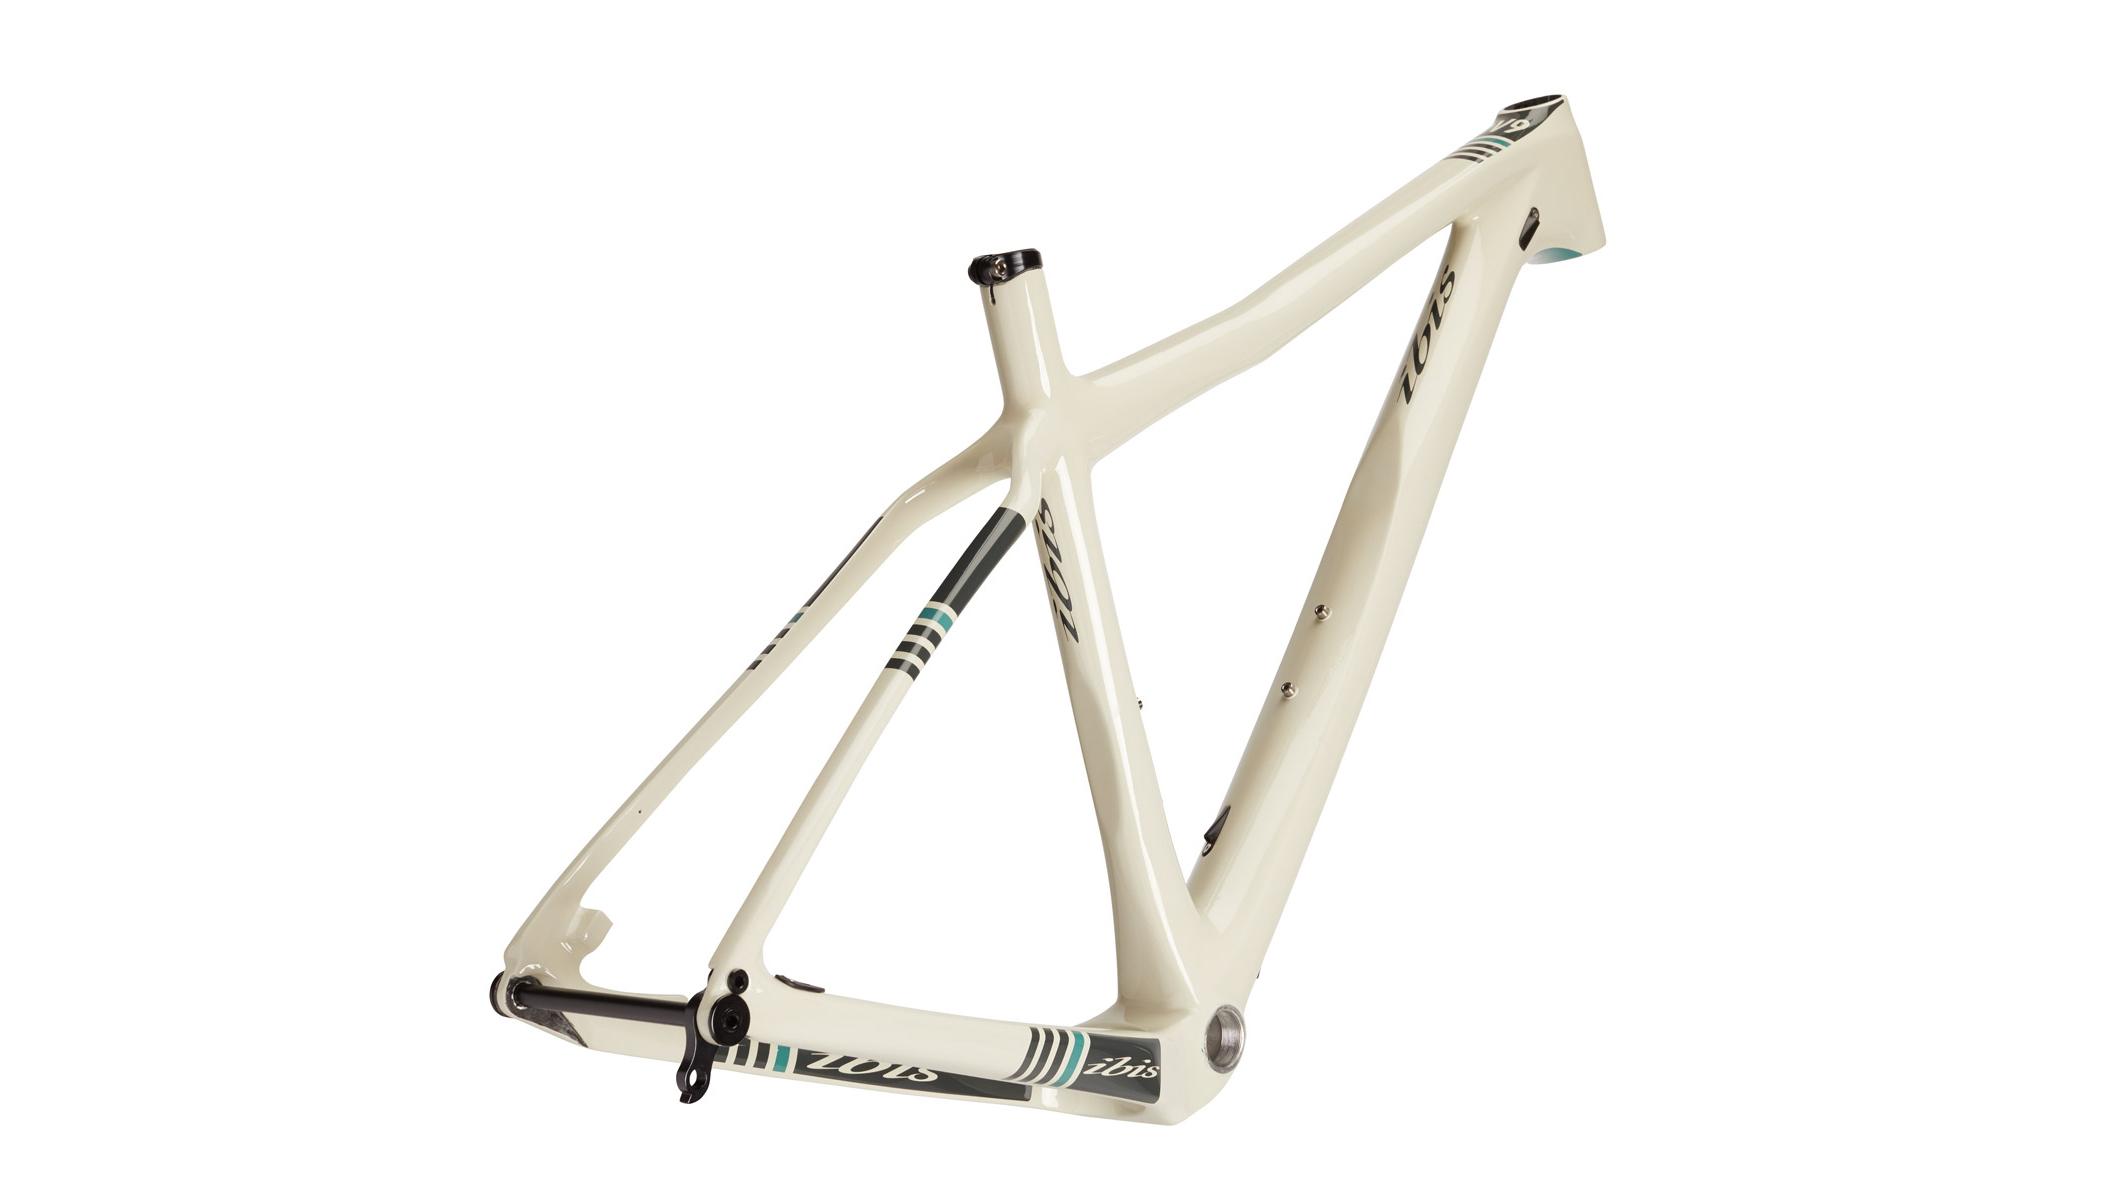 ibis carbon hardtail mountain bicycle frame